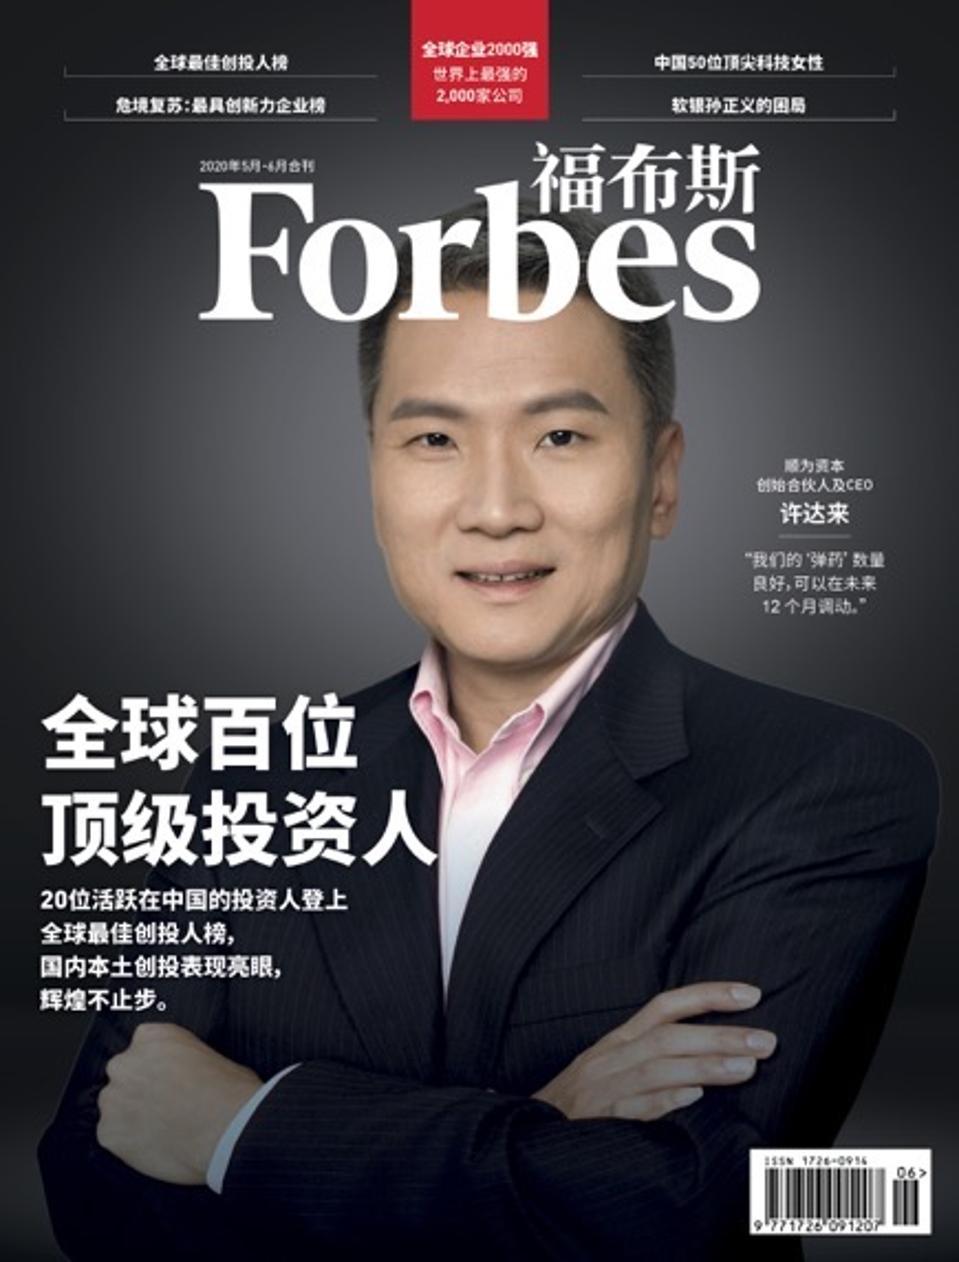 Shunwei Capital CEO Tuck Lye Koh